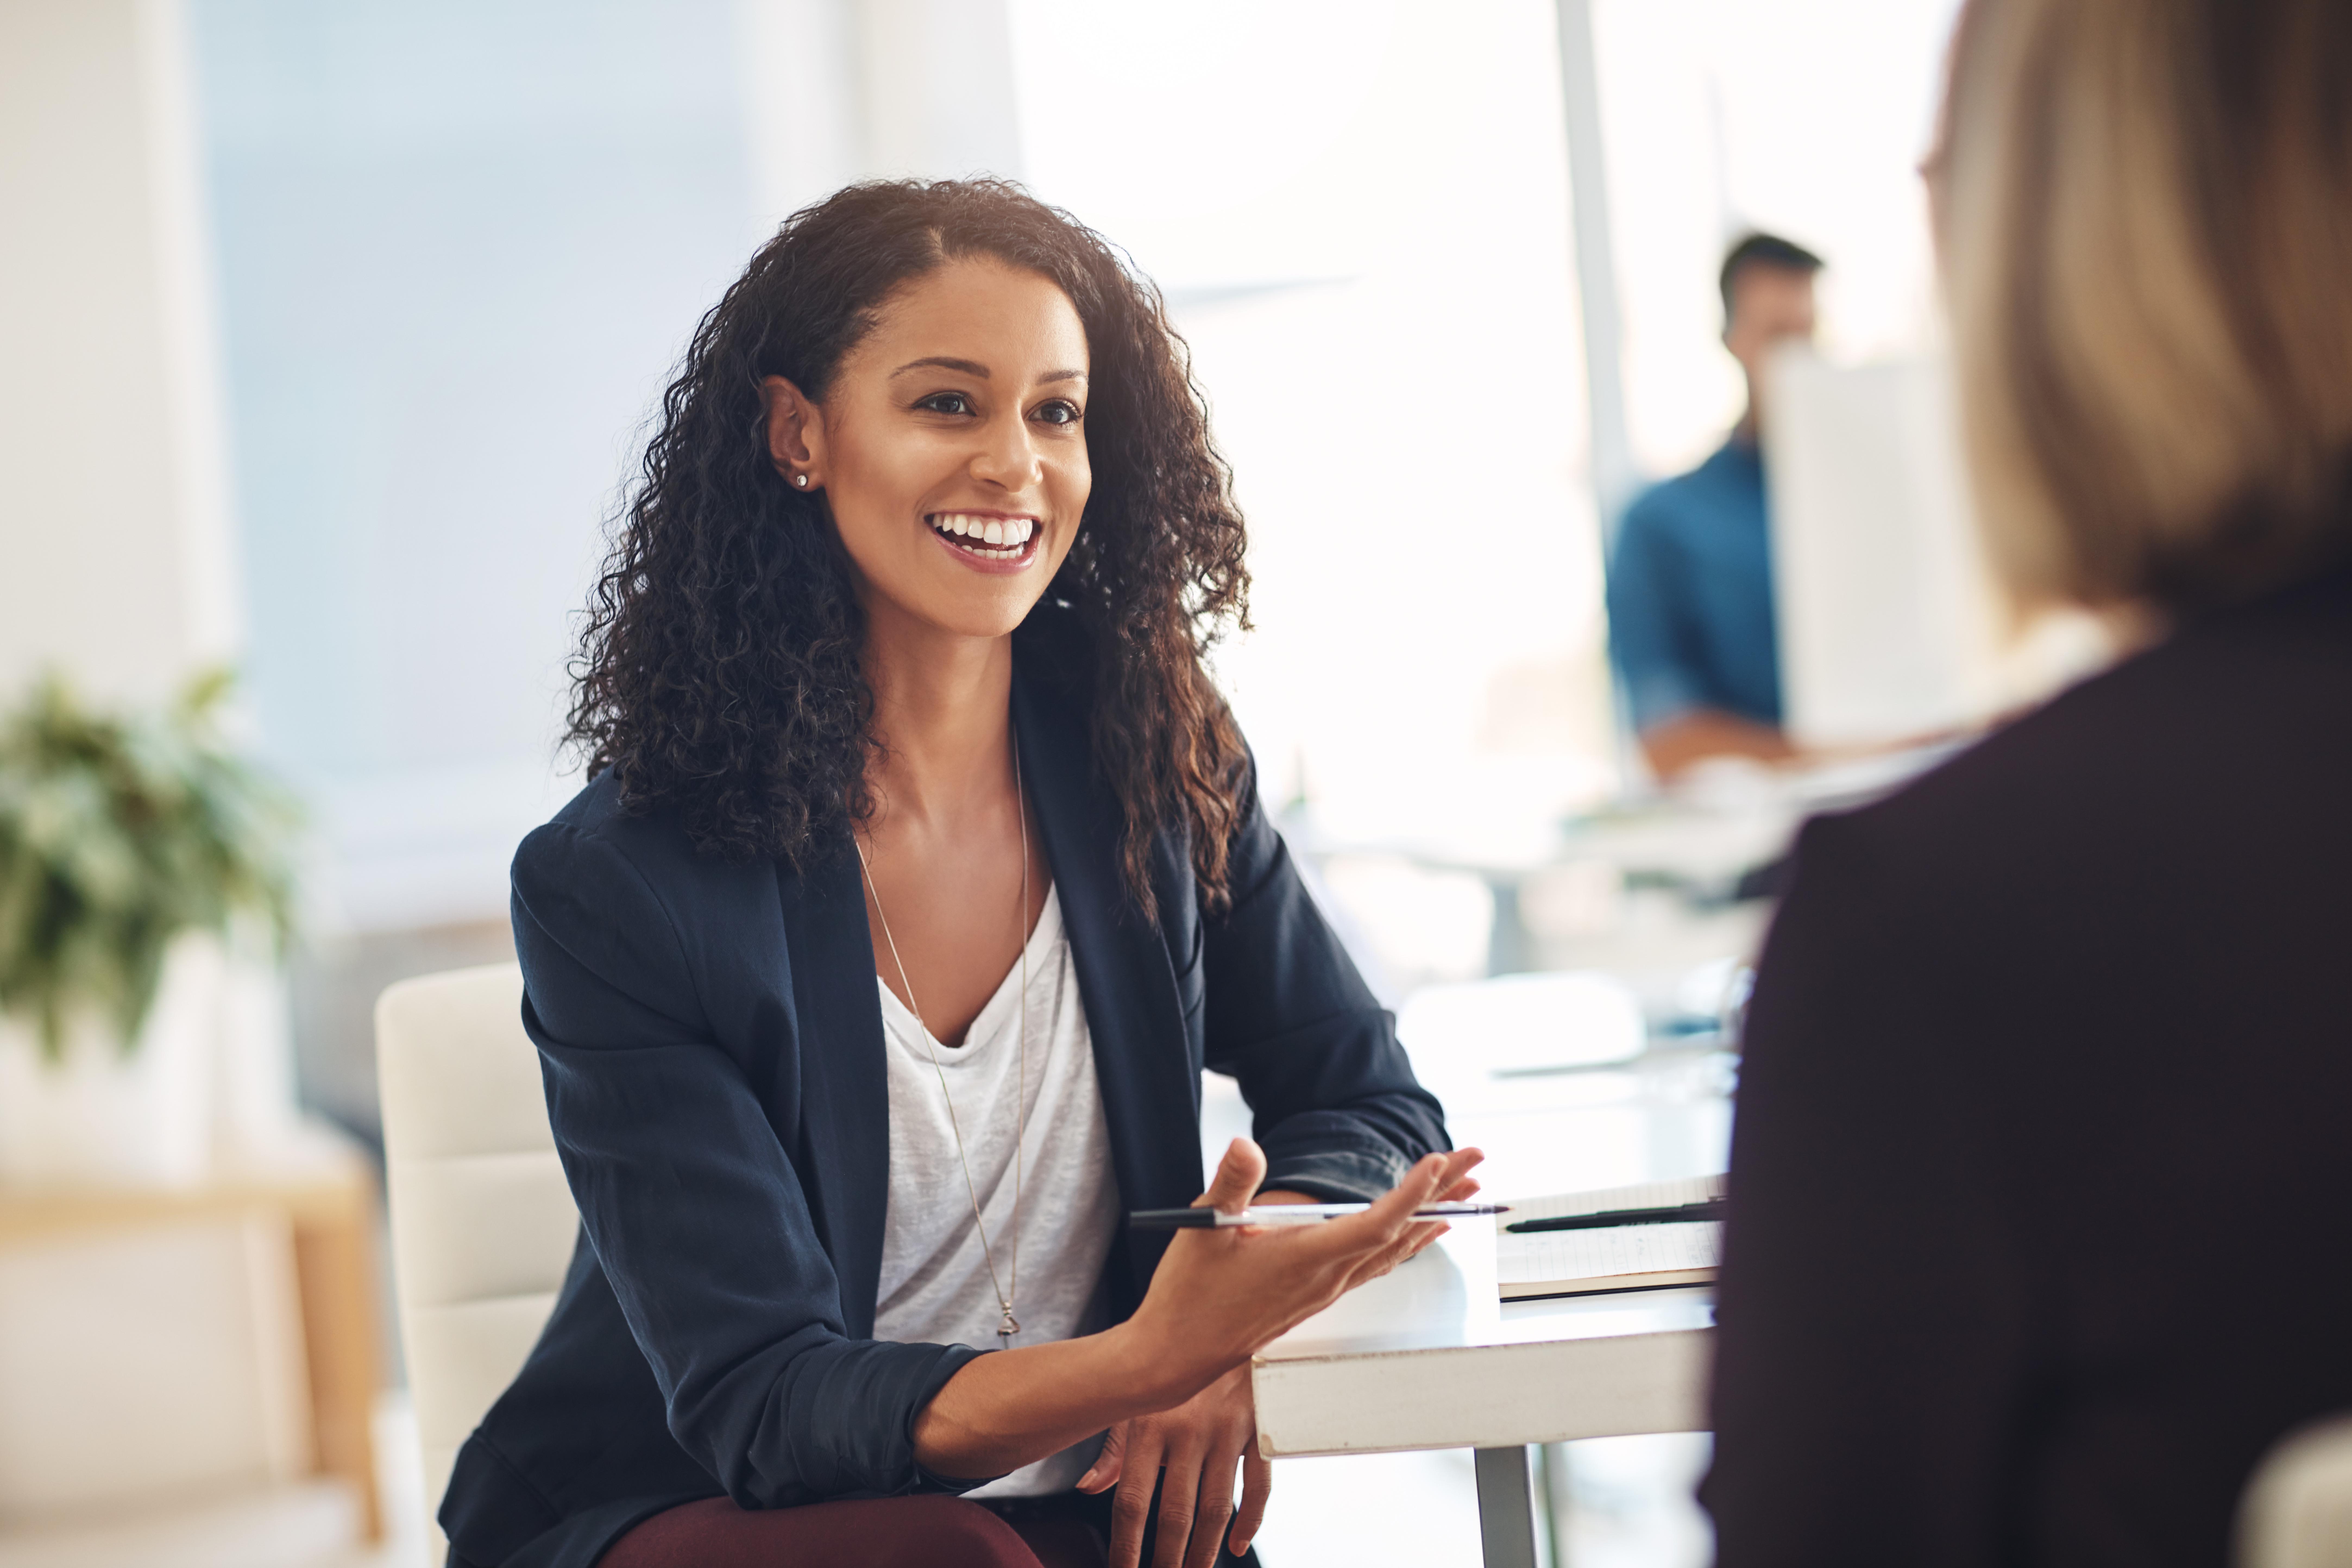 how does diversity affect teamwork